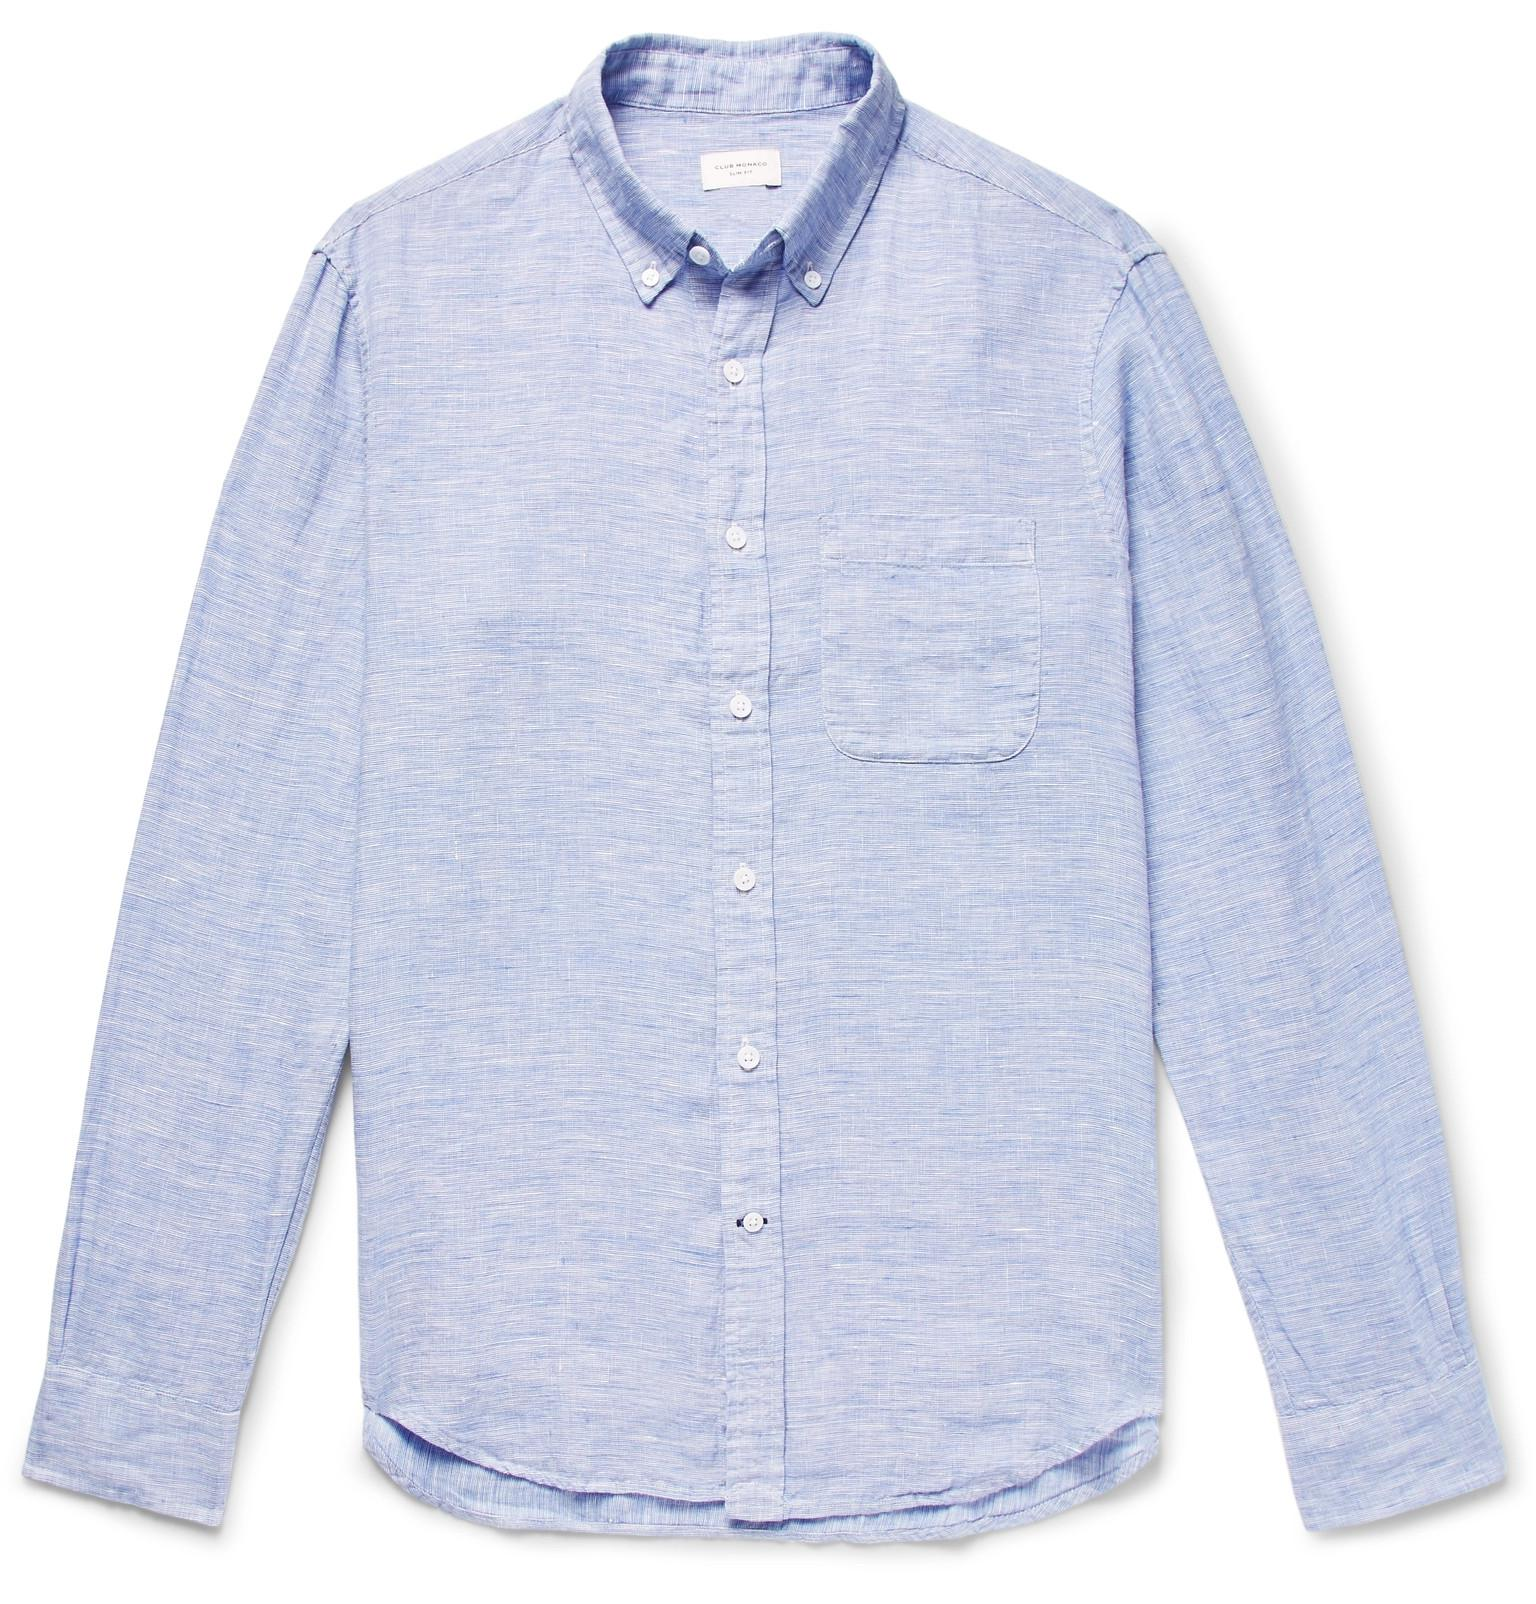 CLUB MONACO Button-down Collar Puppytooth Slub Linen Shirt - Pink We6oXmC6q